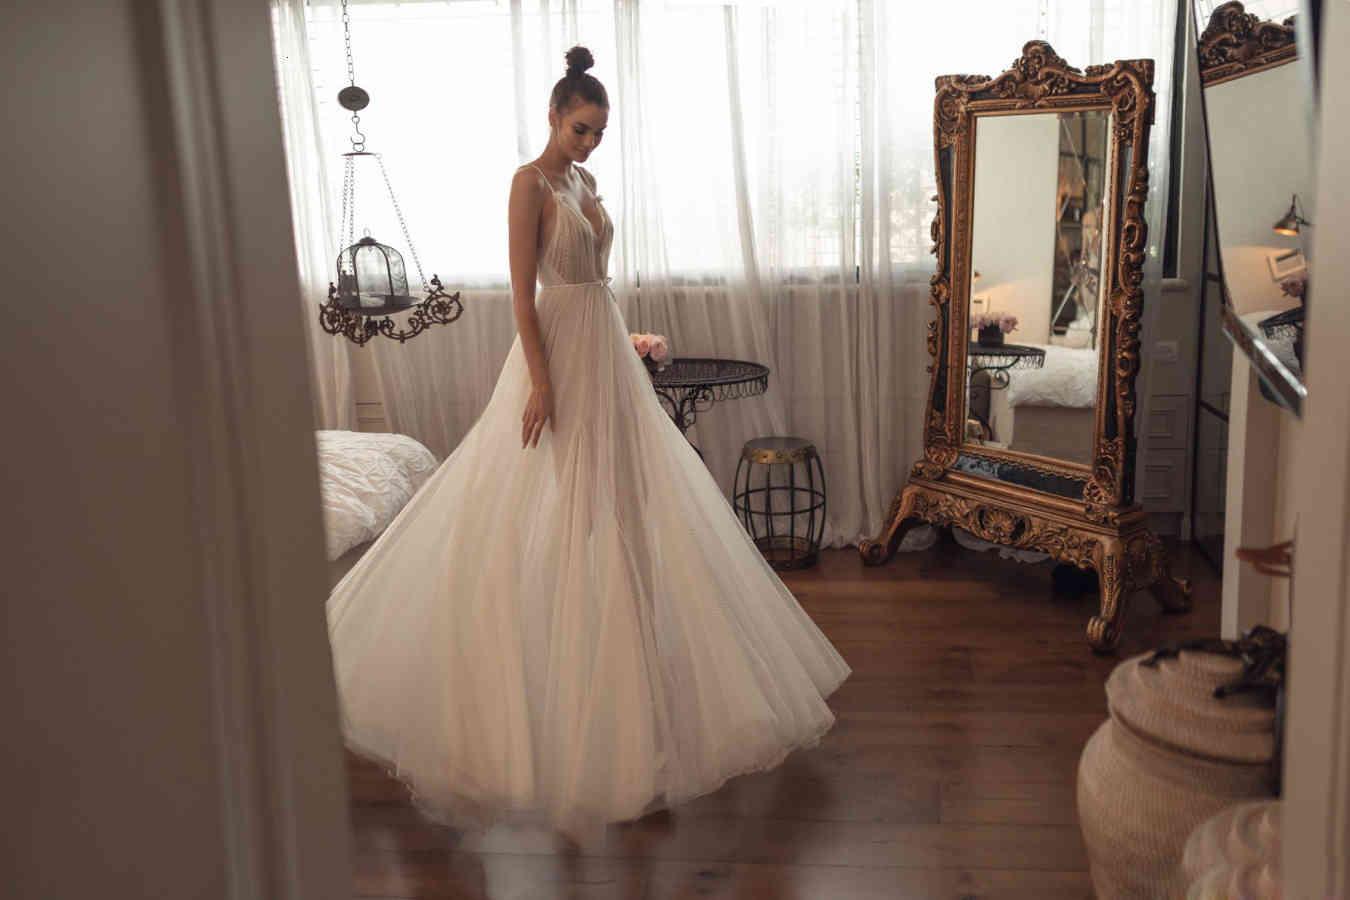 Boho A Line Wedding Dresses Spaghetti V Neck Tulle Bridal Gowns Princess Beach Wedding Dress Cheap